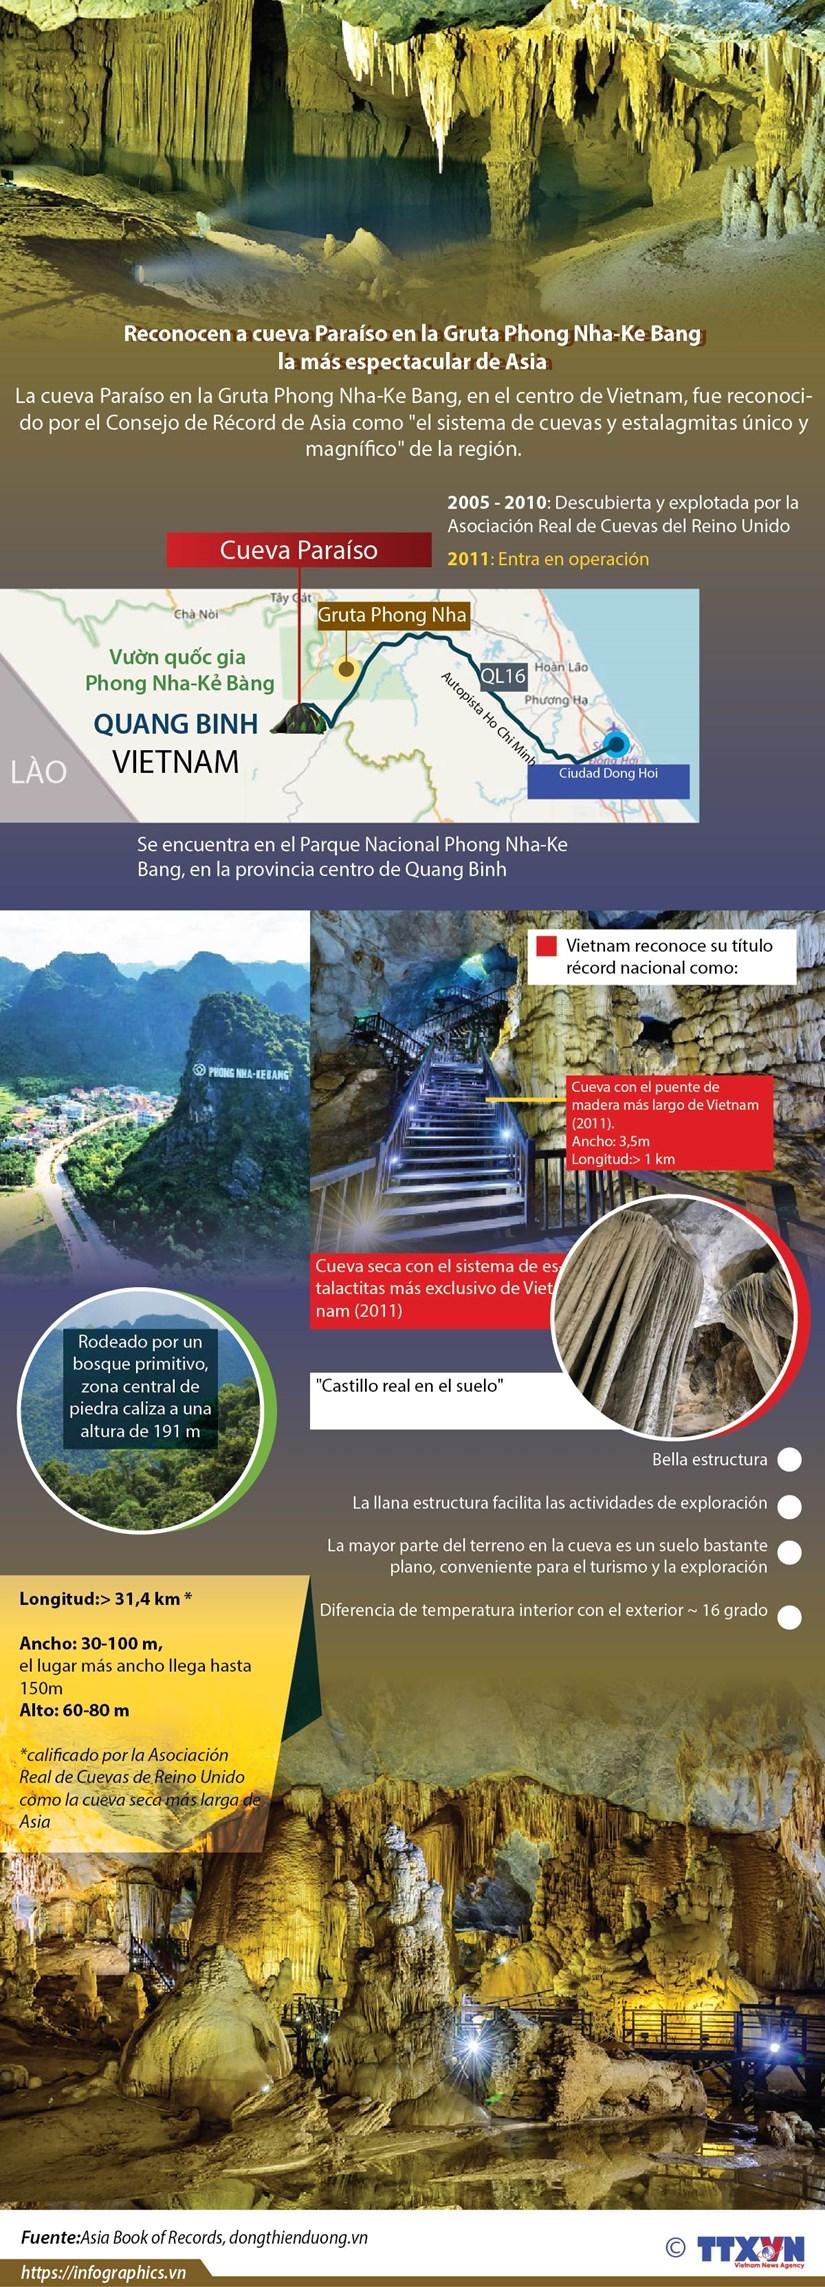 [Info] Reconocen a cueva Paraiso en la Gruta Phong Nha-Ke Bang la mas espectacular de Asia hinh anh 1